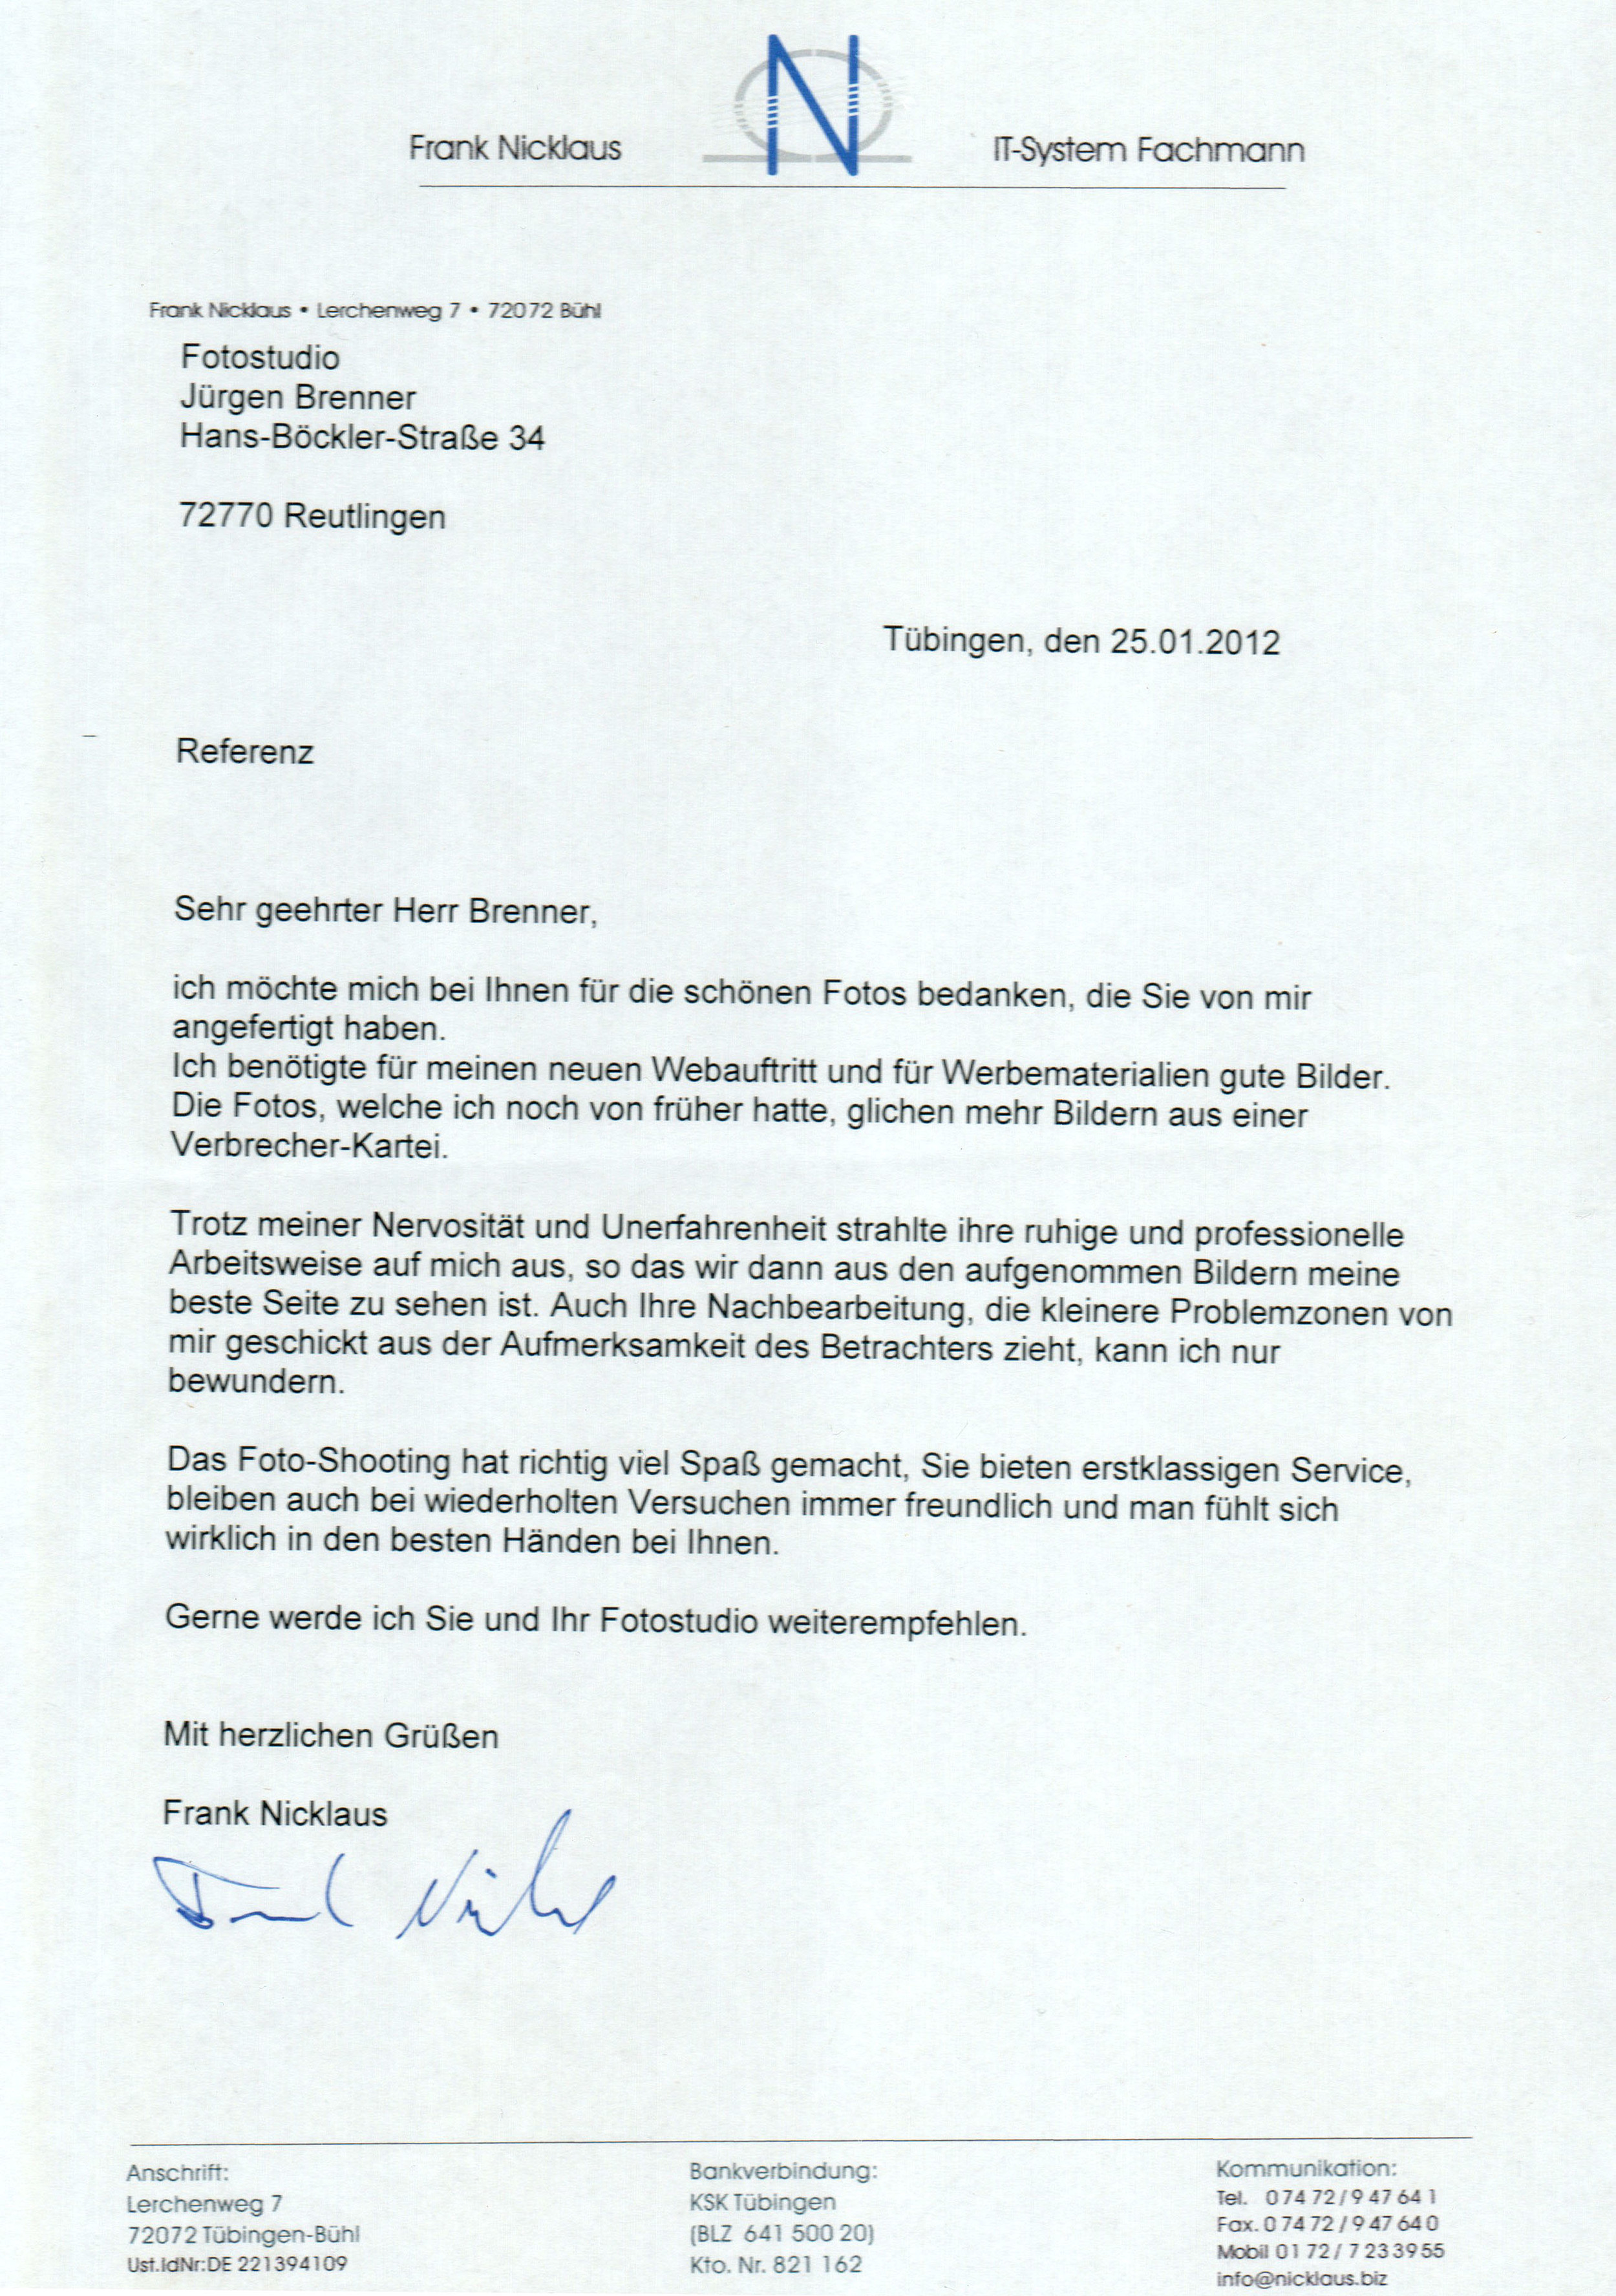 Zeugnis-Frank-Nicklaus.jpg